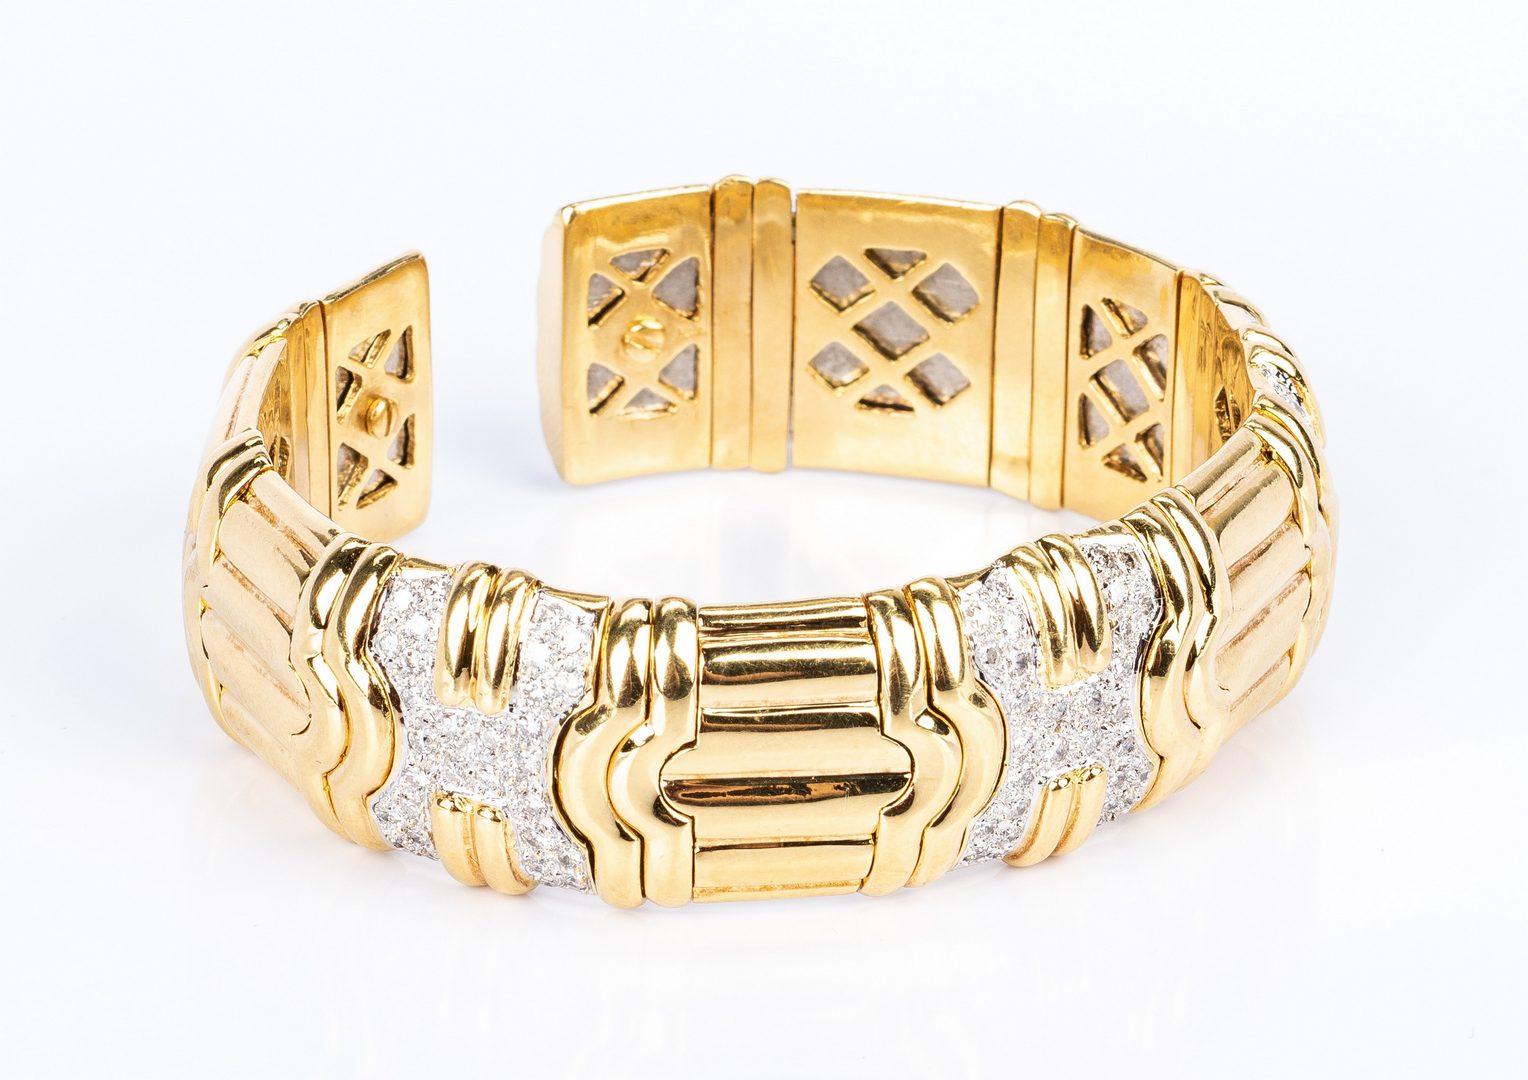 Lot 35: 18K Diamond Cuff Bracelet